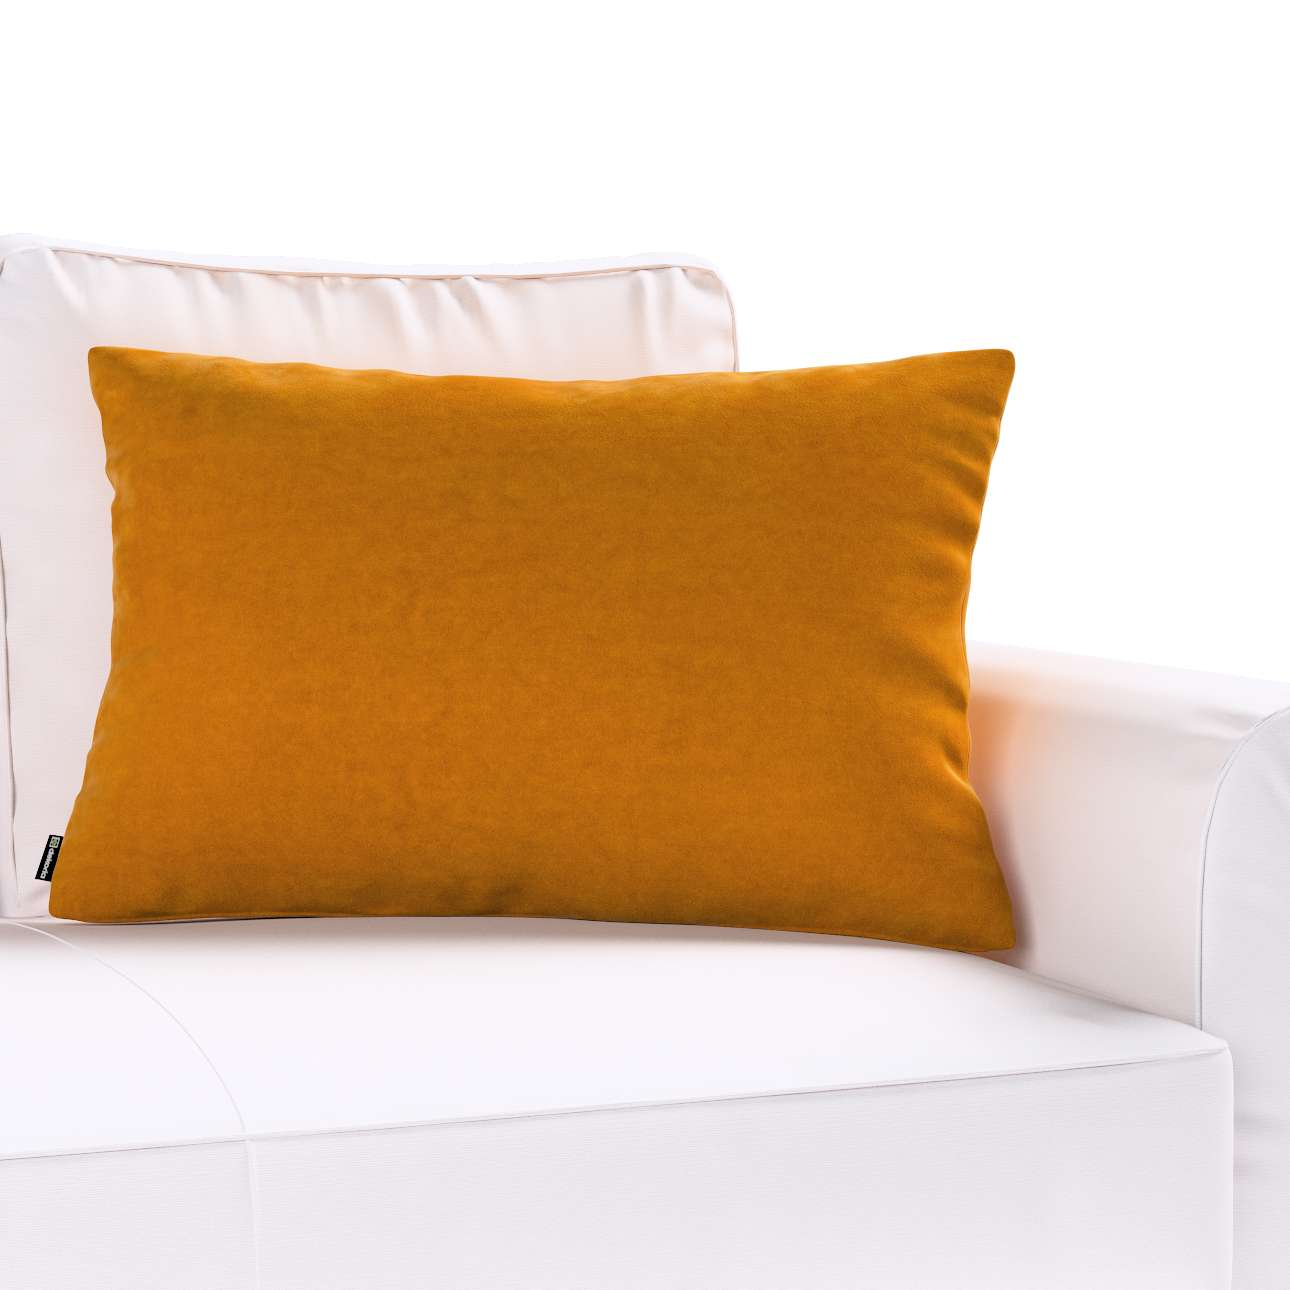 Kinga cushion cover 60x40cm in collection Velvet, fabric: 704-23